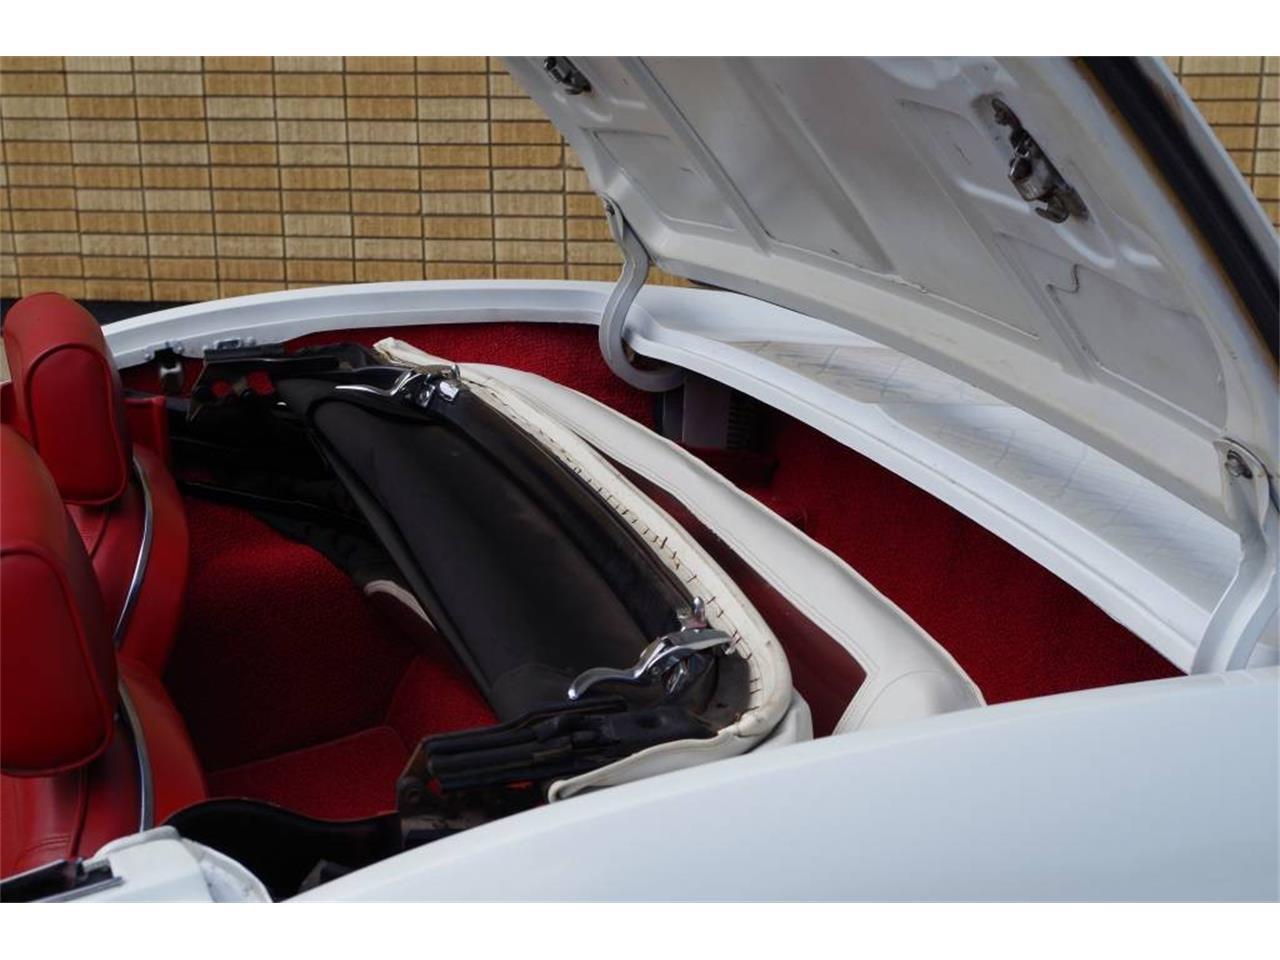 Large Picture of 1967 Chevrolet Corvette - $129,995.00 Offered by Vintage Vettes, LLC - PZ9R